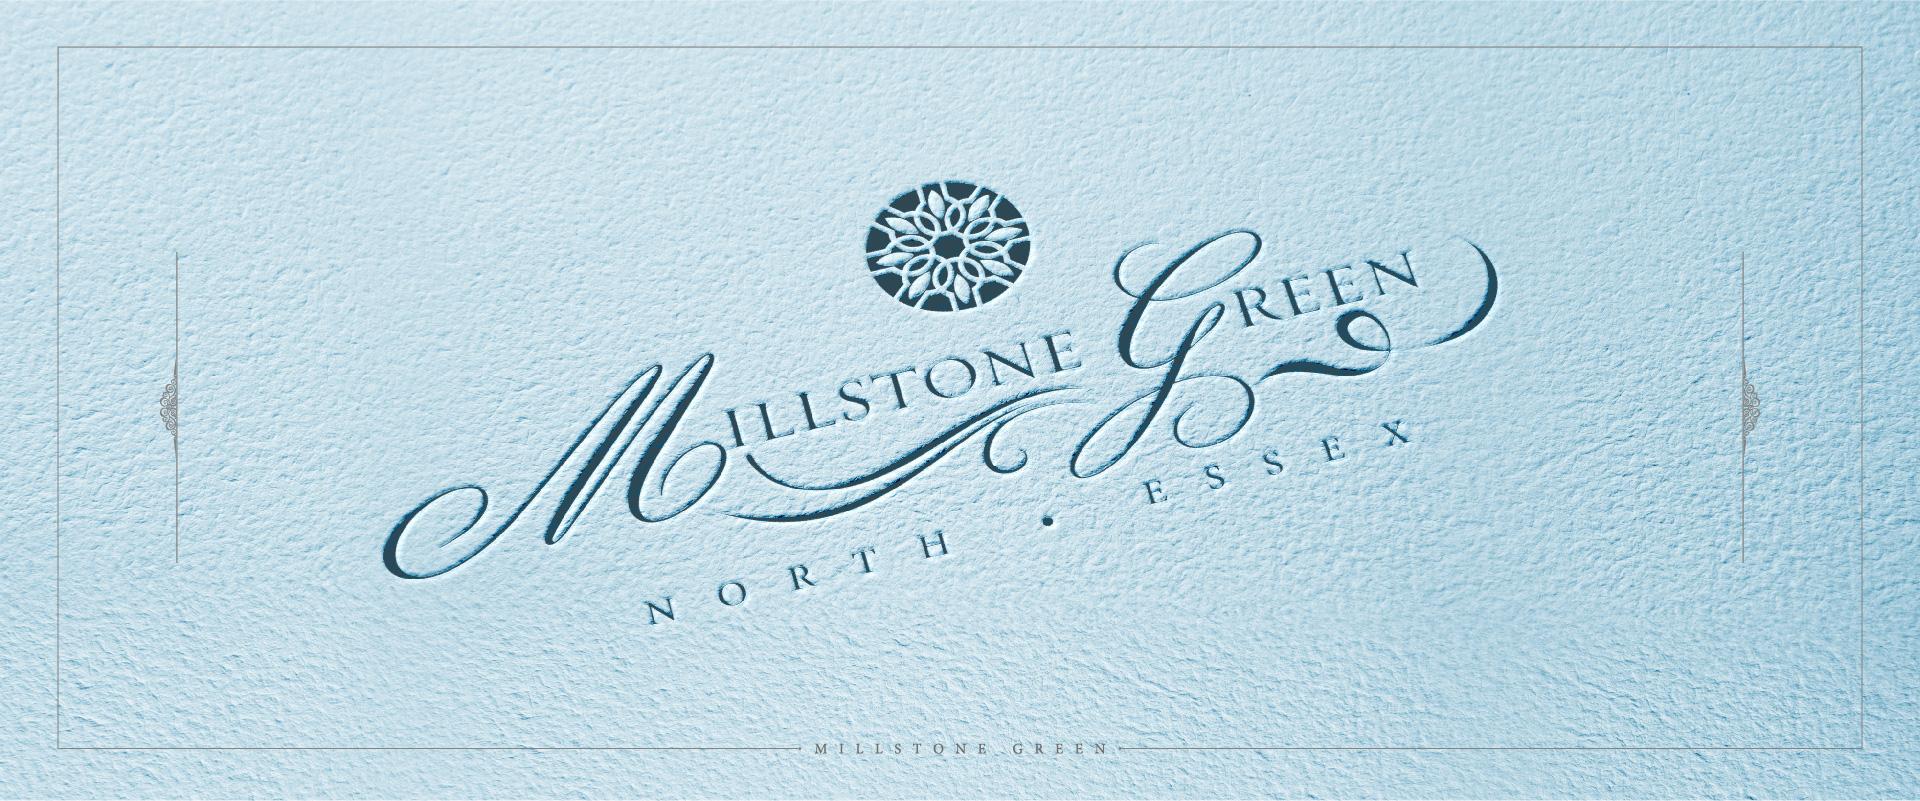 Millstone Green